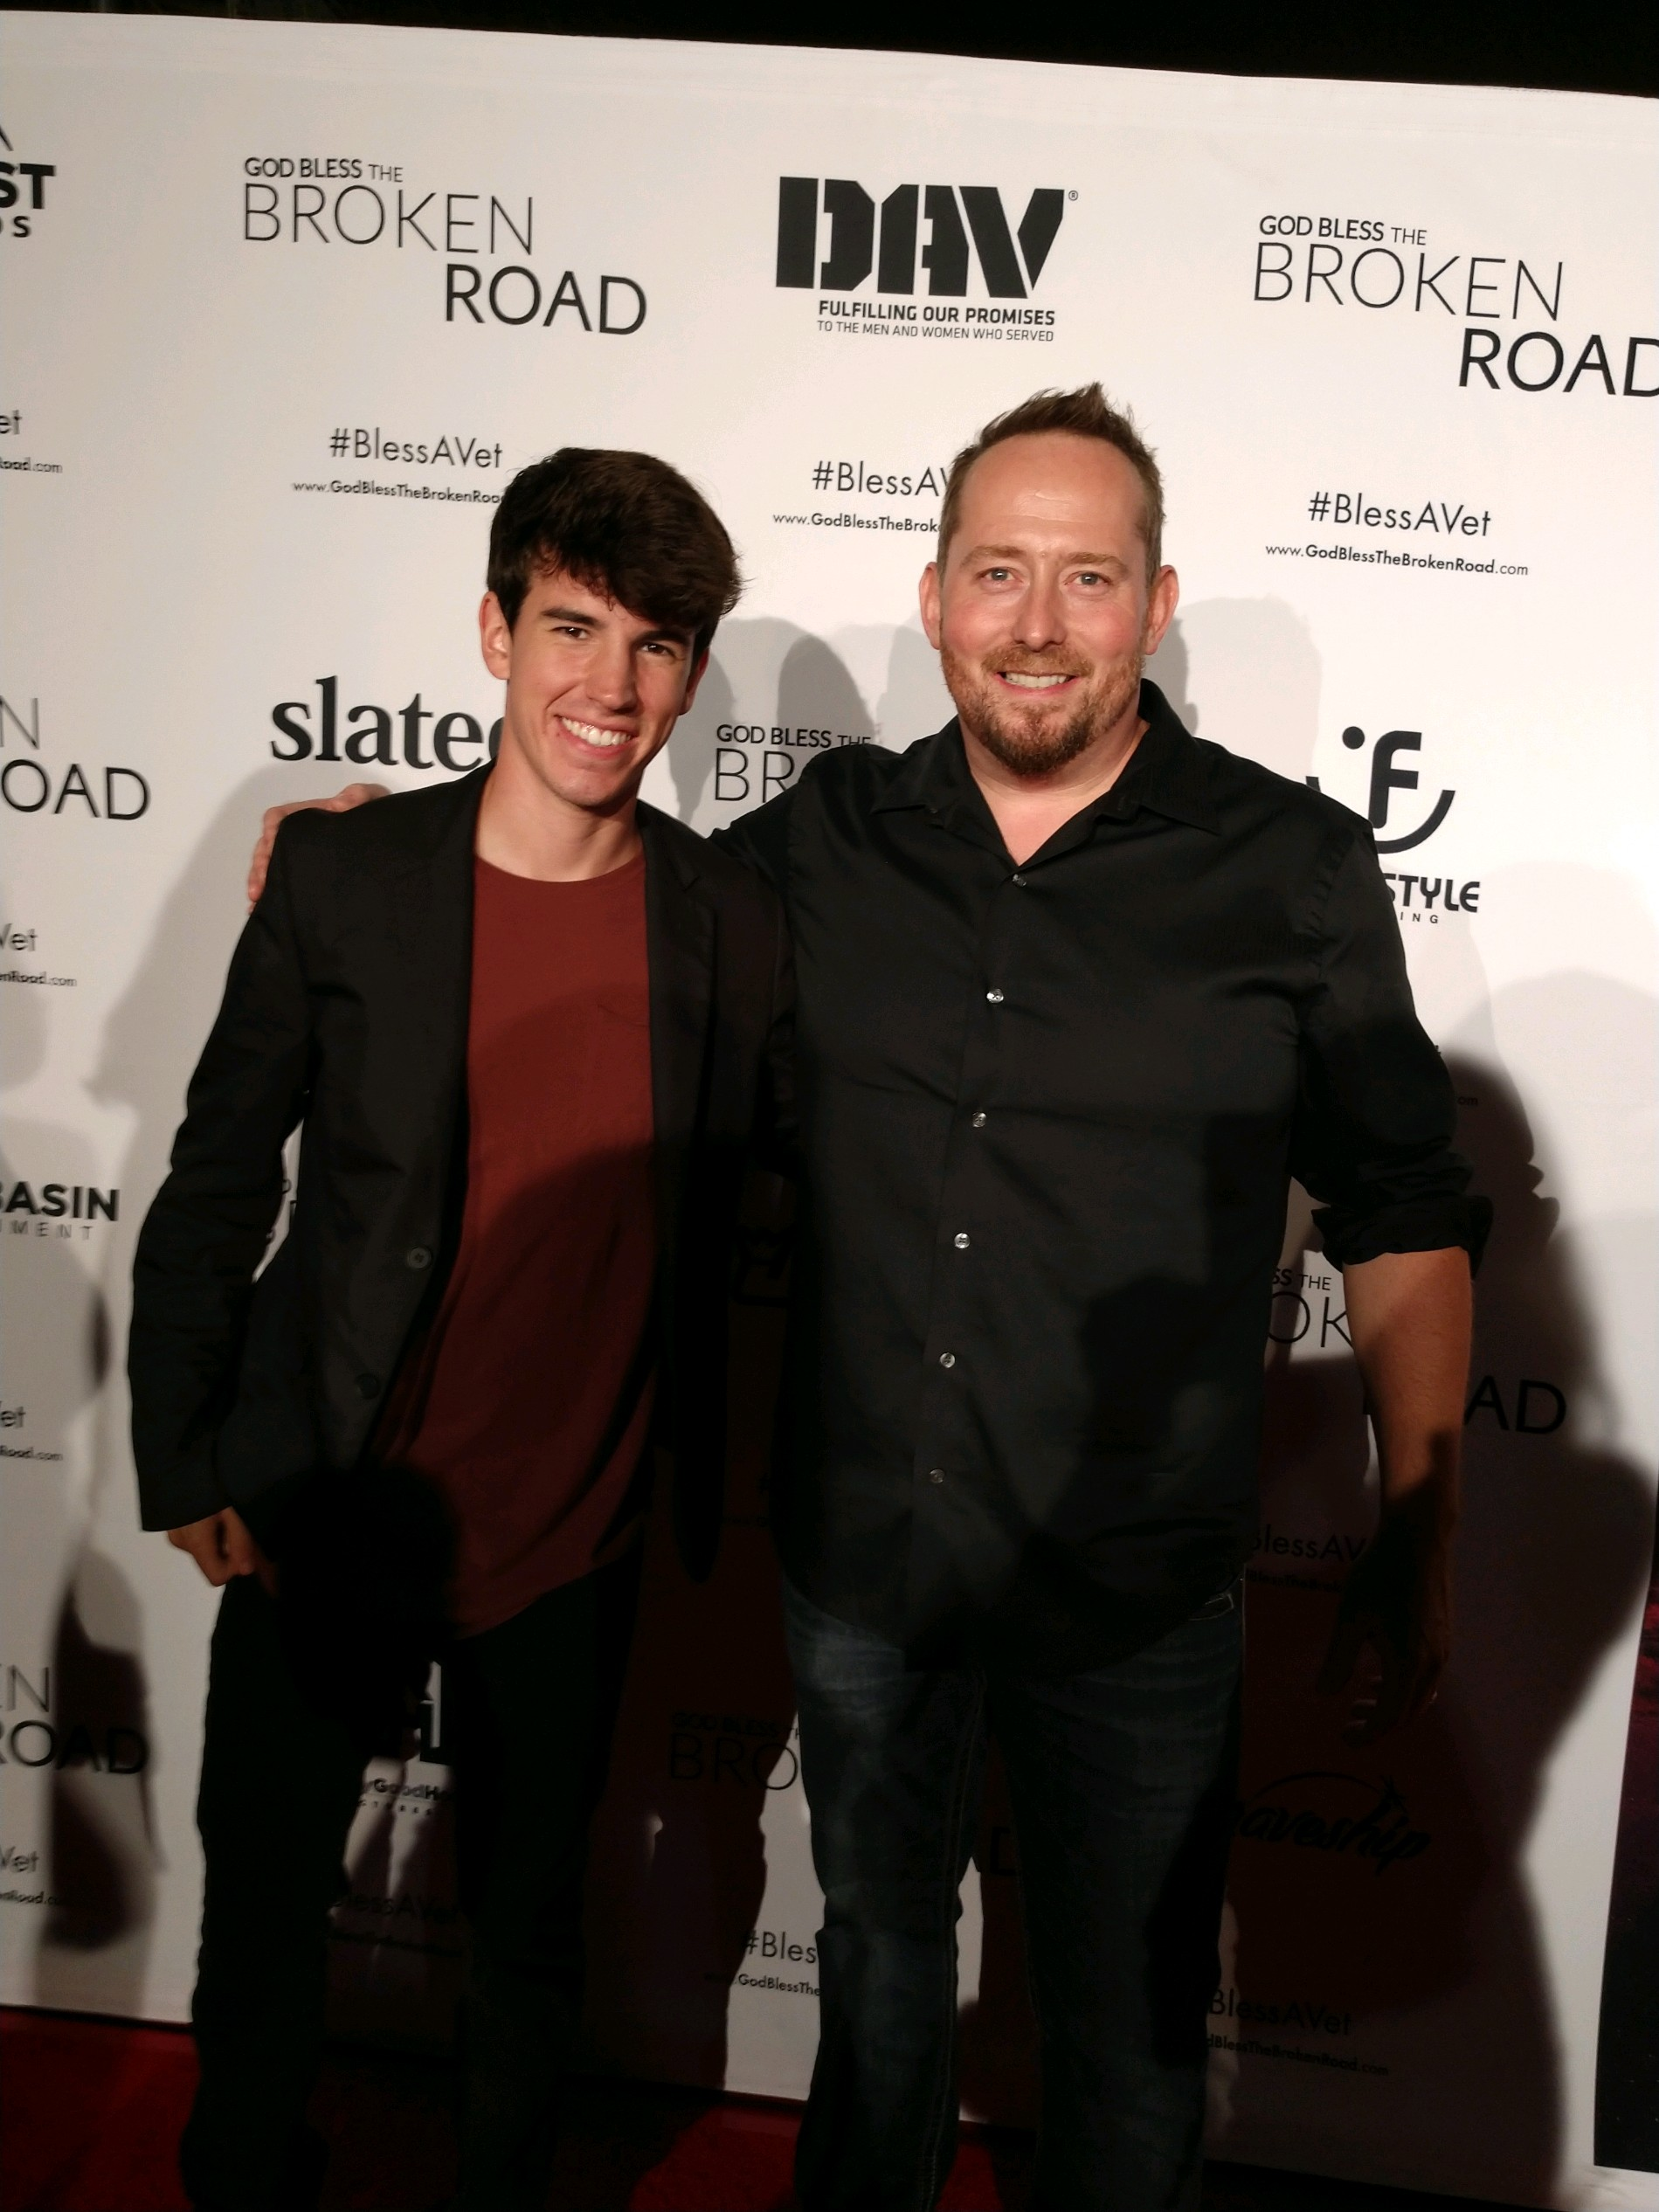 Derek Brandon with Director, Producer, Writer, Harold Cronk